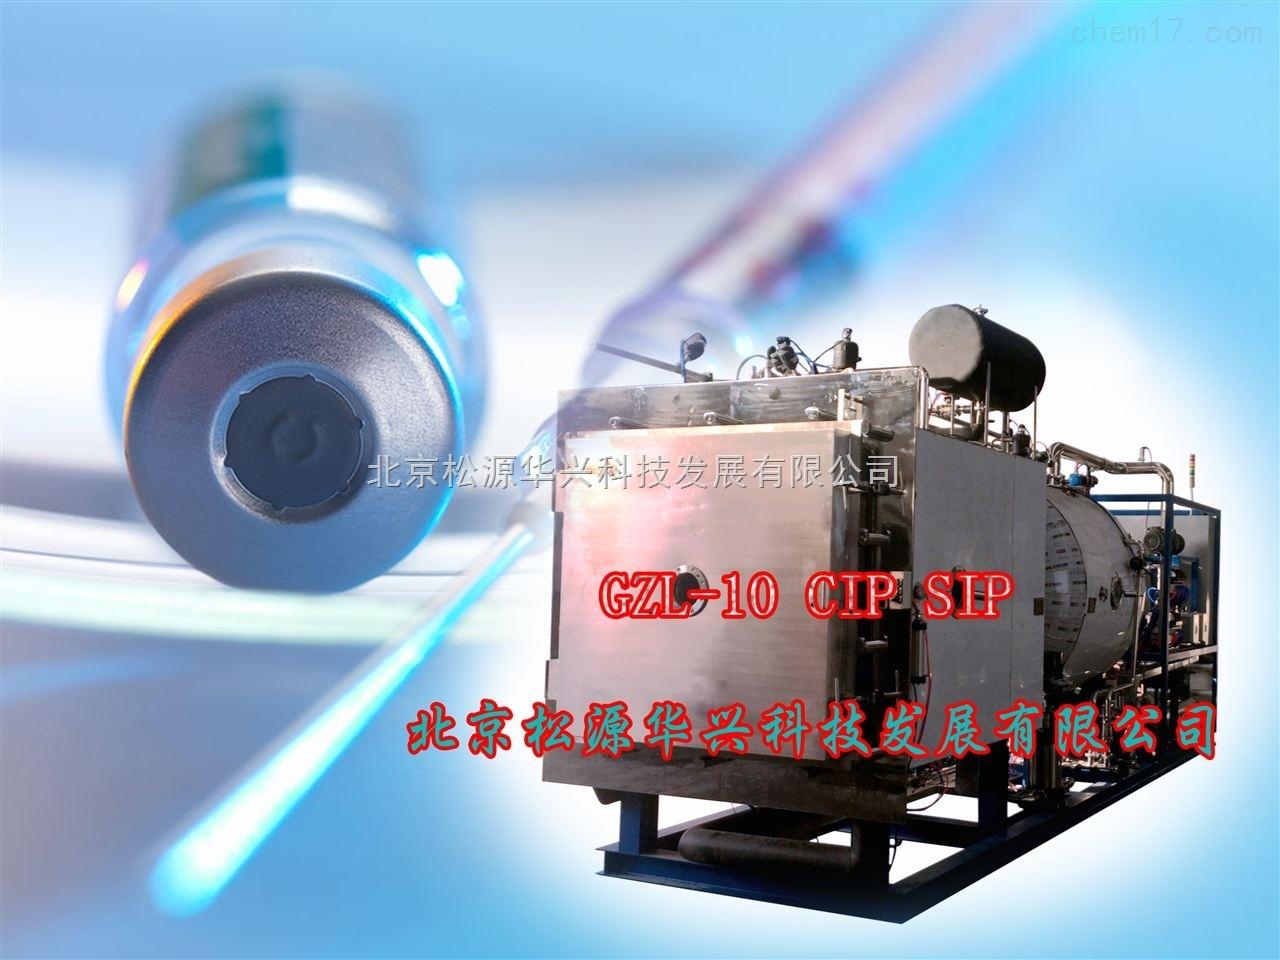 GZL-10冻干机/冷冻干燥机/GZL-10 CIP SIP真空冷冻干燥机/医用冷冻干燥机厂家